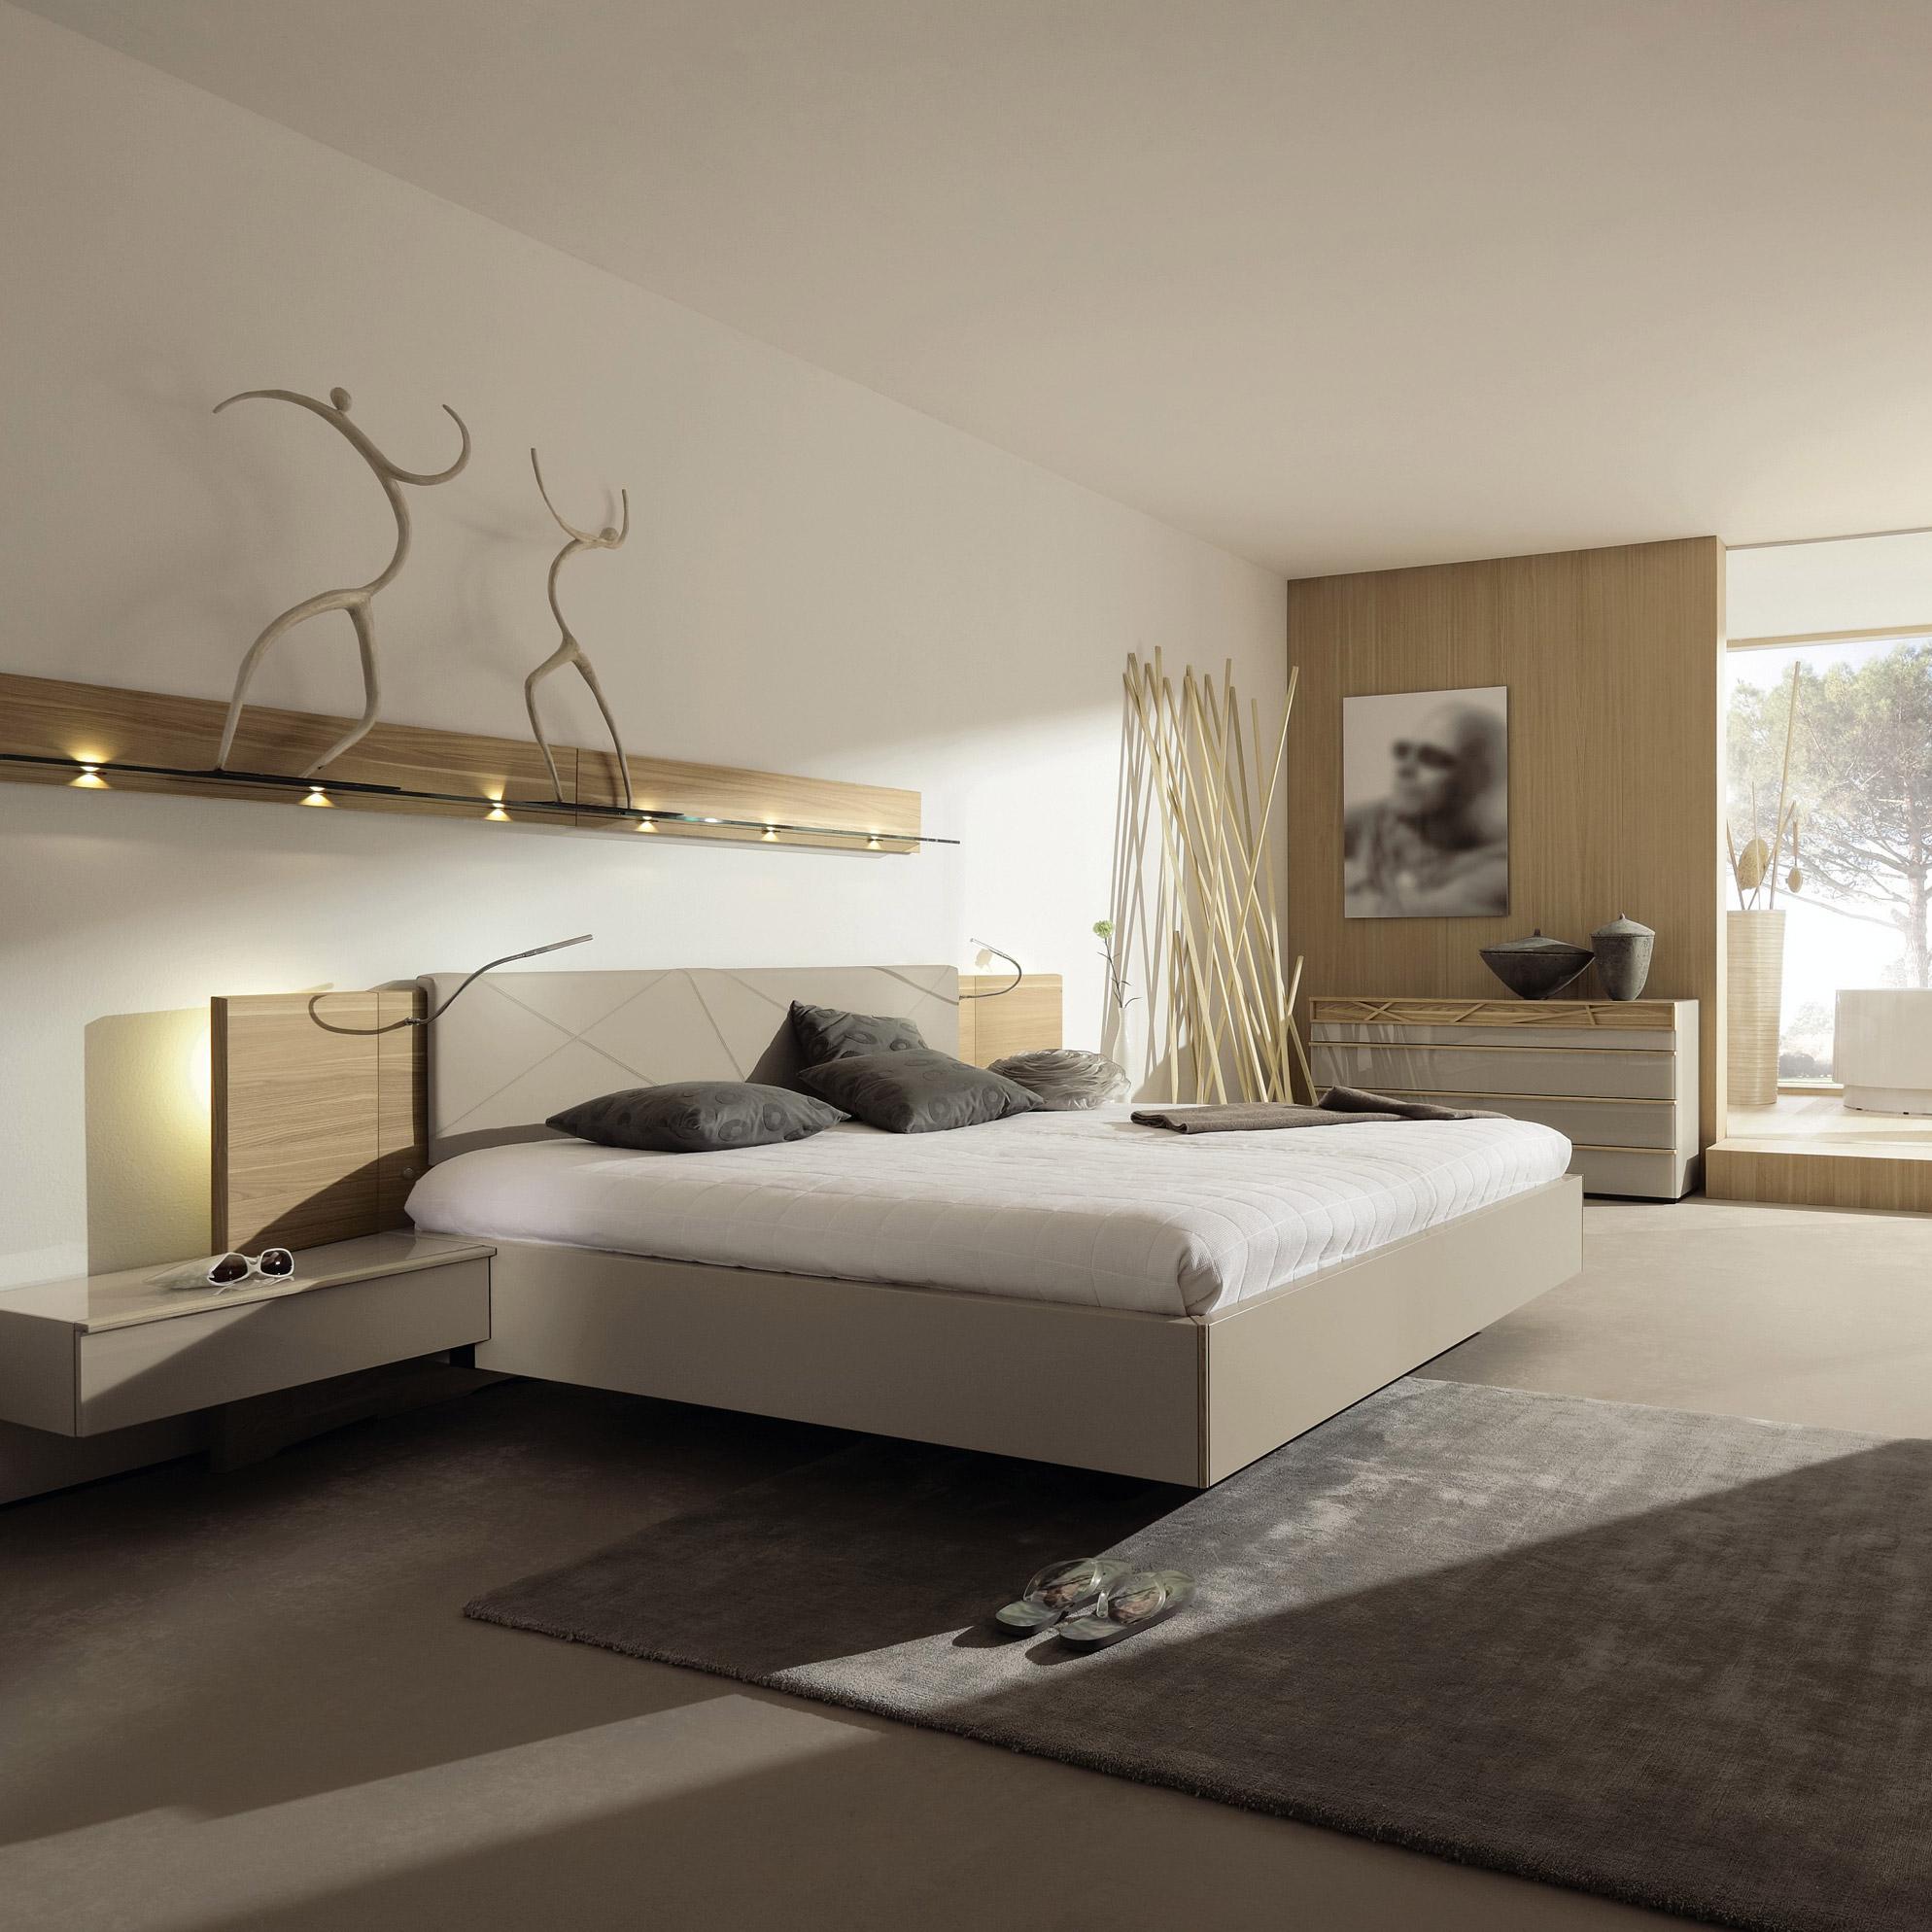 schlafen entspannen. Black Bedroom Furniture Sets. Home Design Ideas